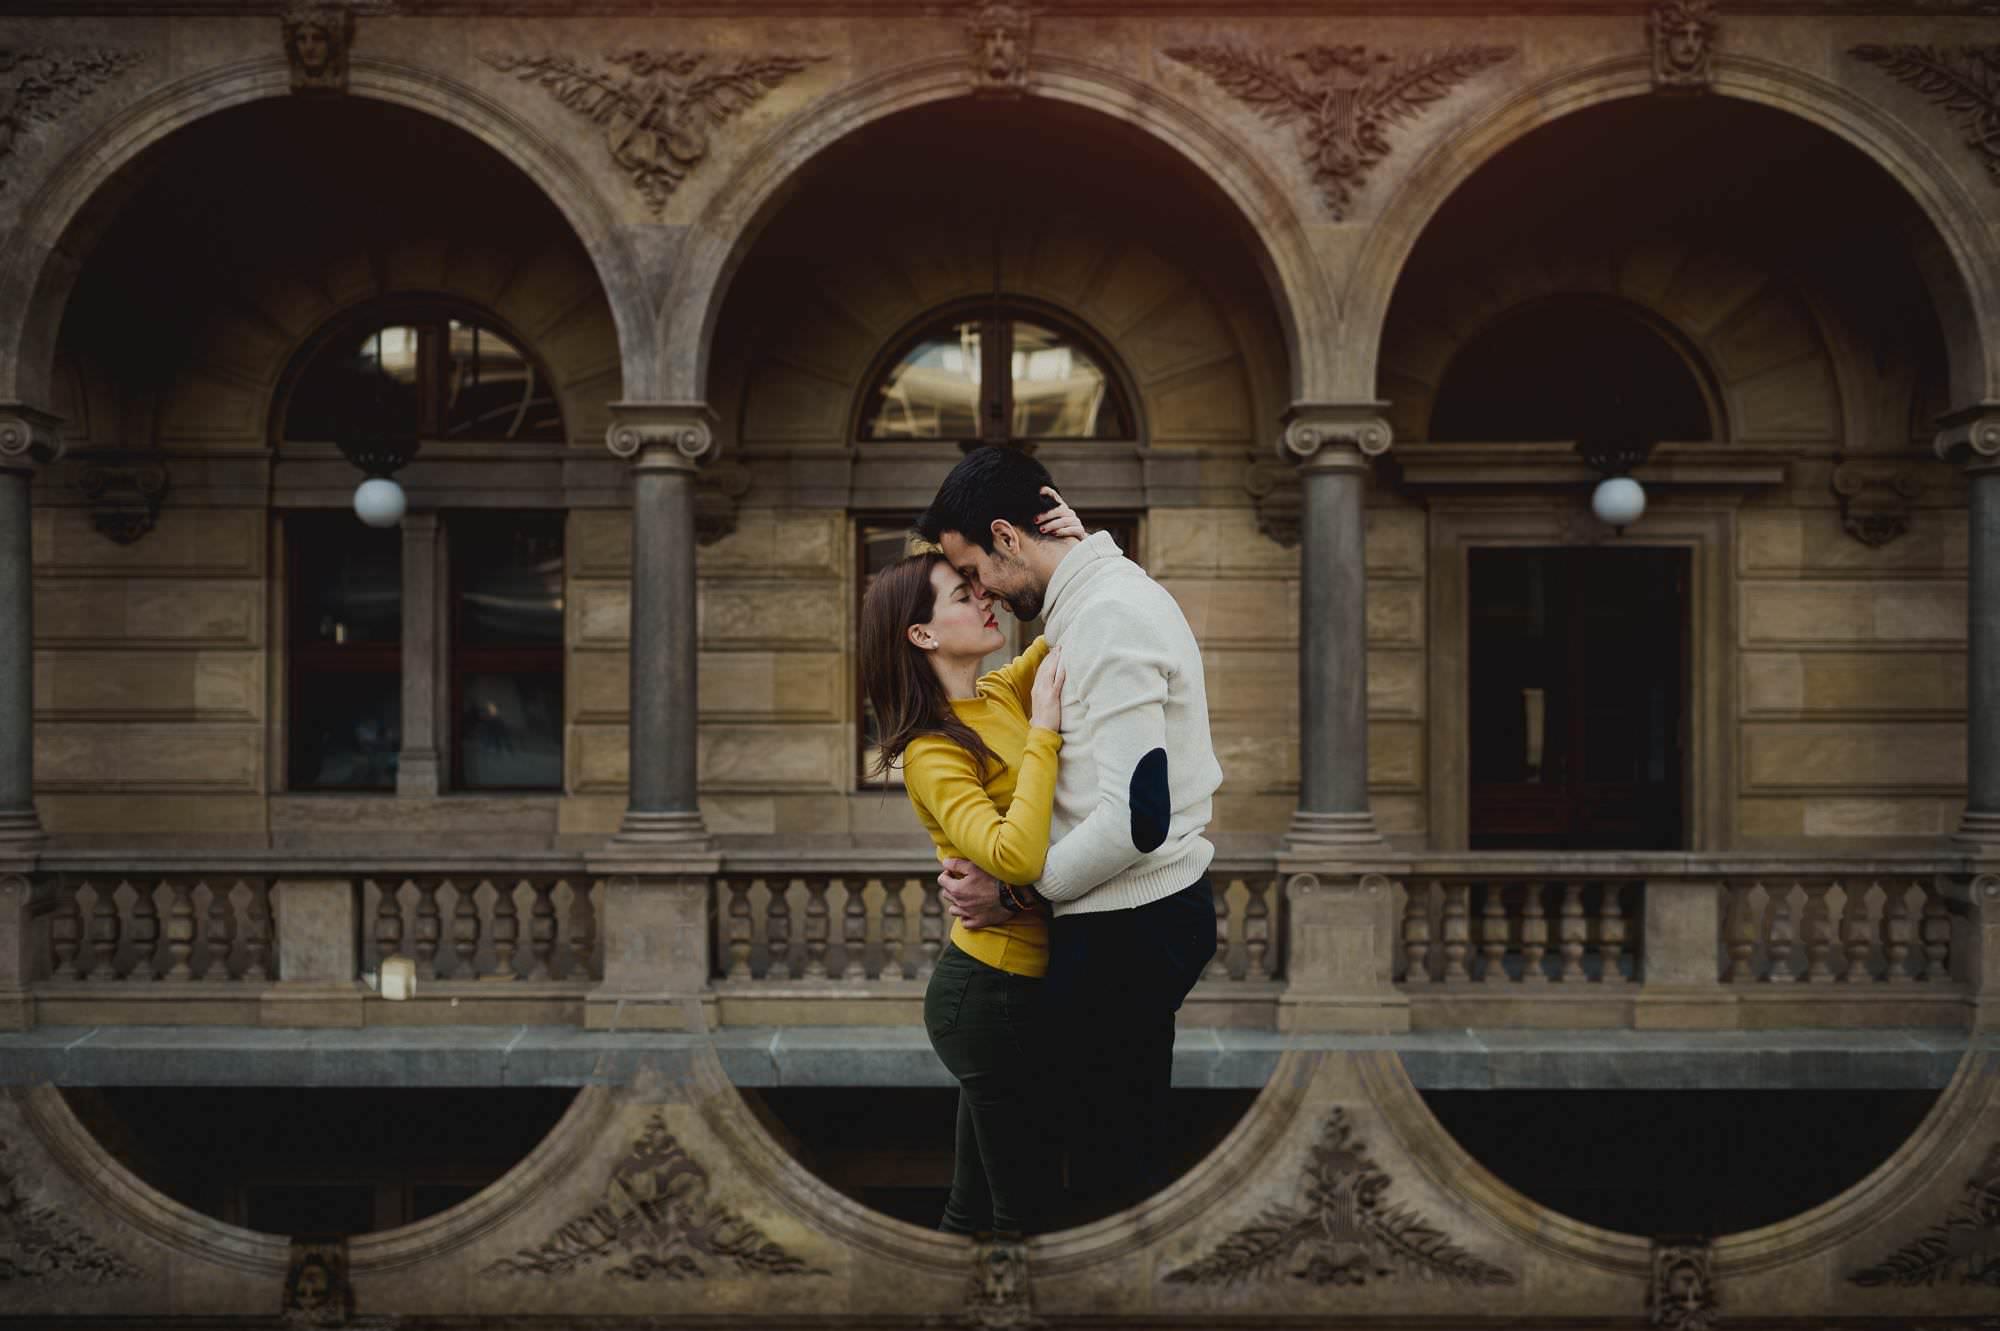 Recherche-Photographe-mariage-paris-tarifs-photographie-mariages-wedding-planning-julesetmoi-j&m-Braulio Lara-6.jpg